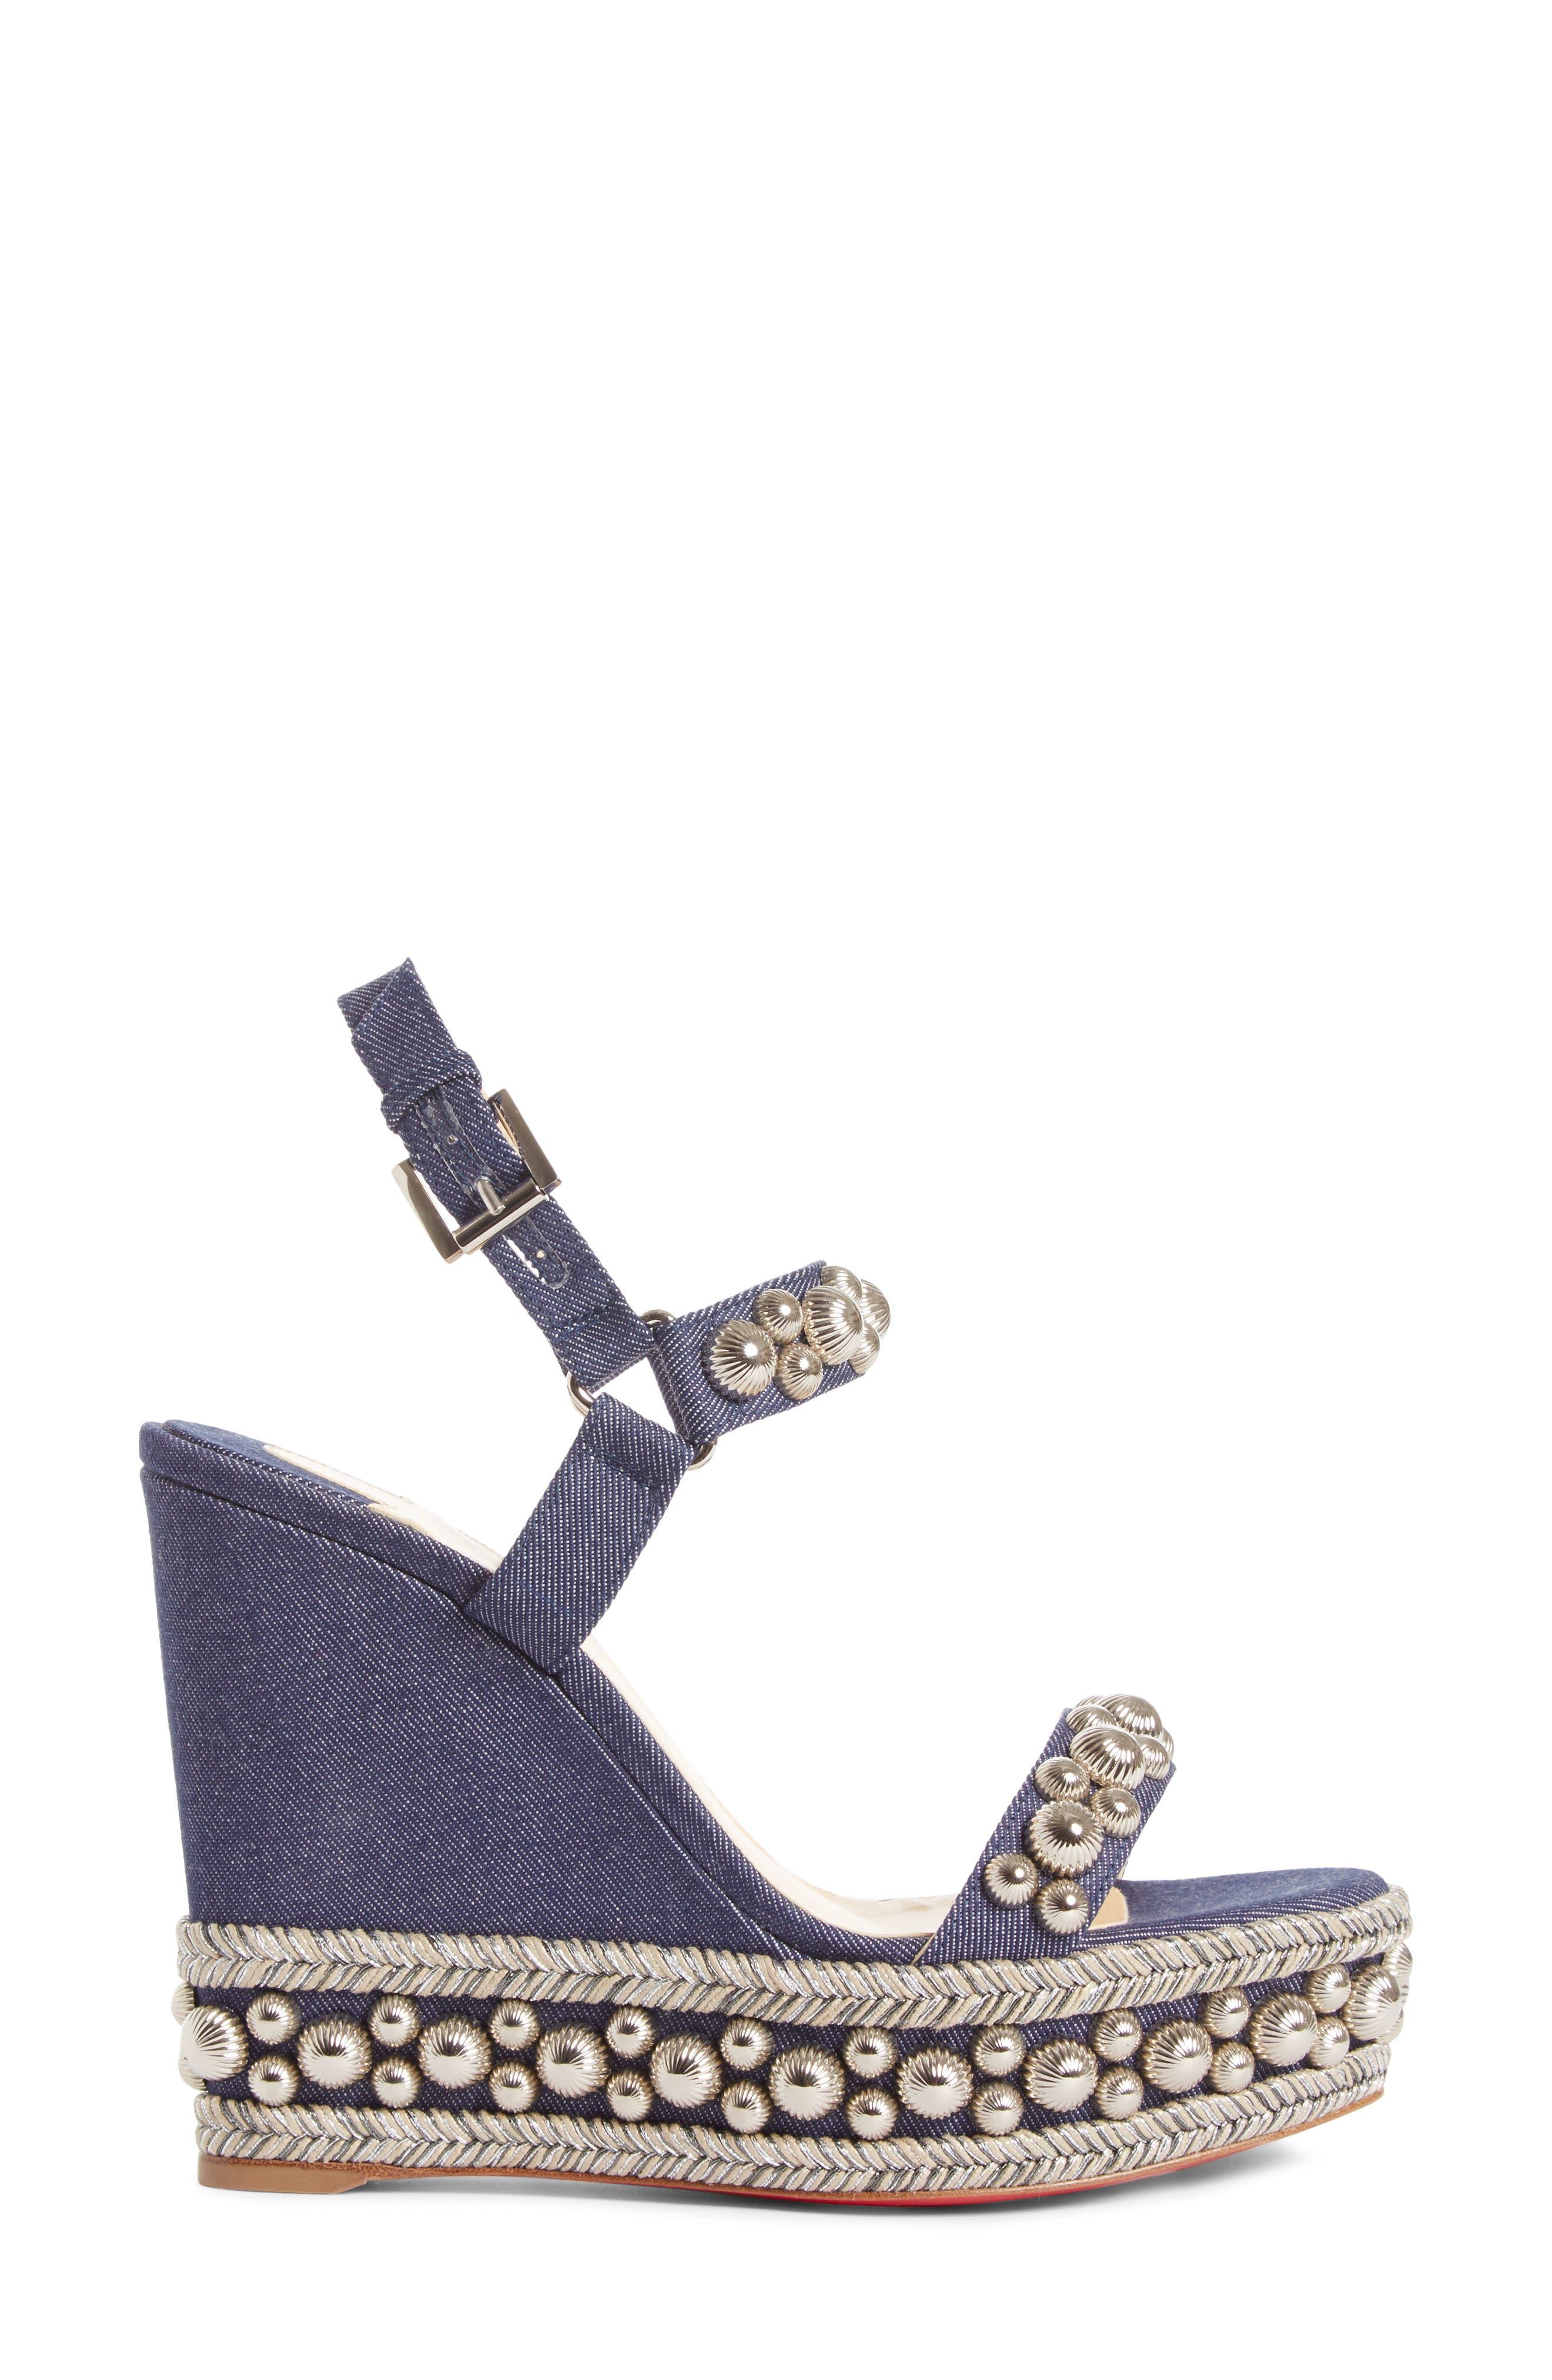 Rondaclou Studded Wedge Sandal,                             Alternate thumbnail 3, color,                             Denim Blue